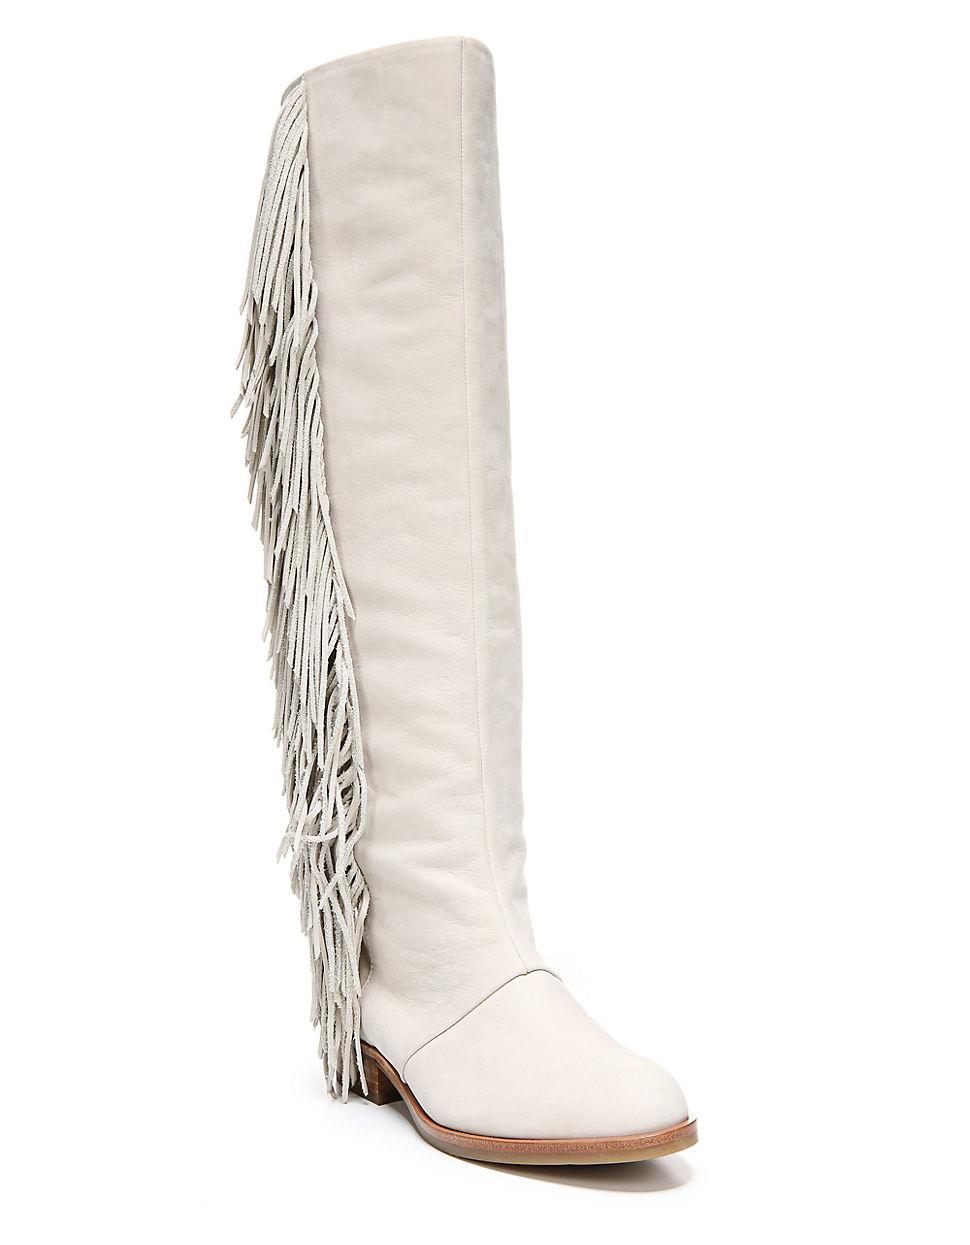 f8653426d2cfc Sam Edelman Josephine Fringe-trimmed Boots in White - Lyst